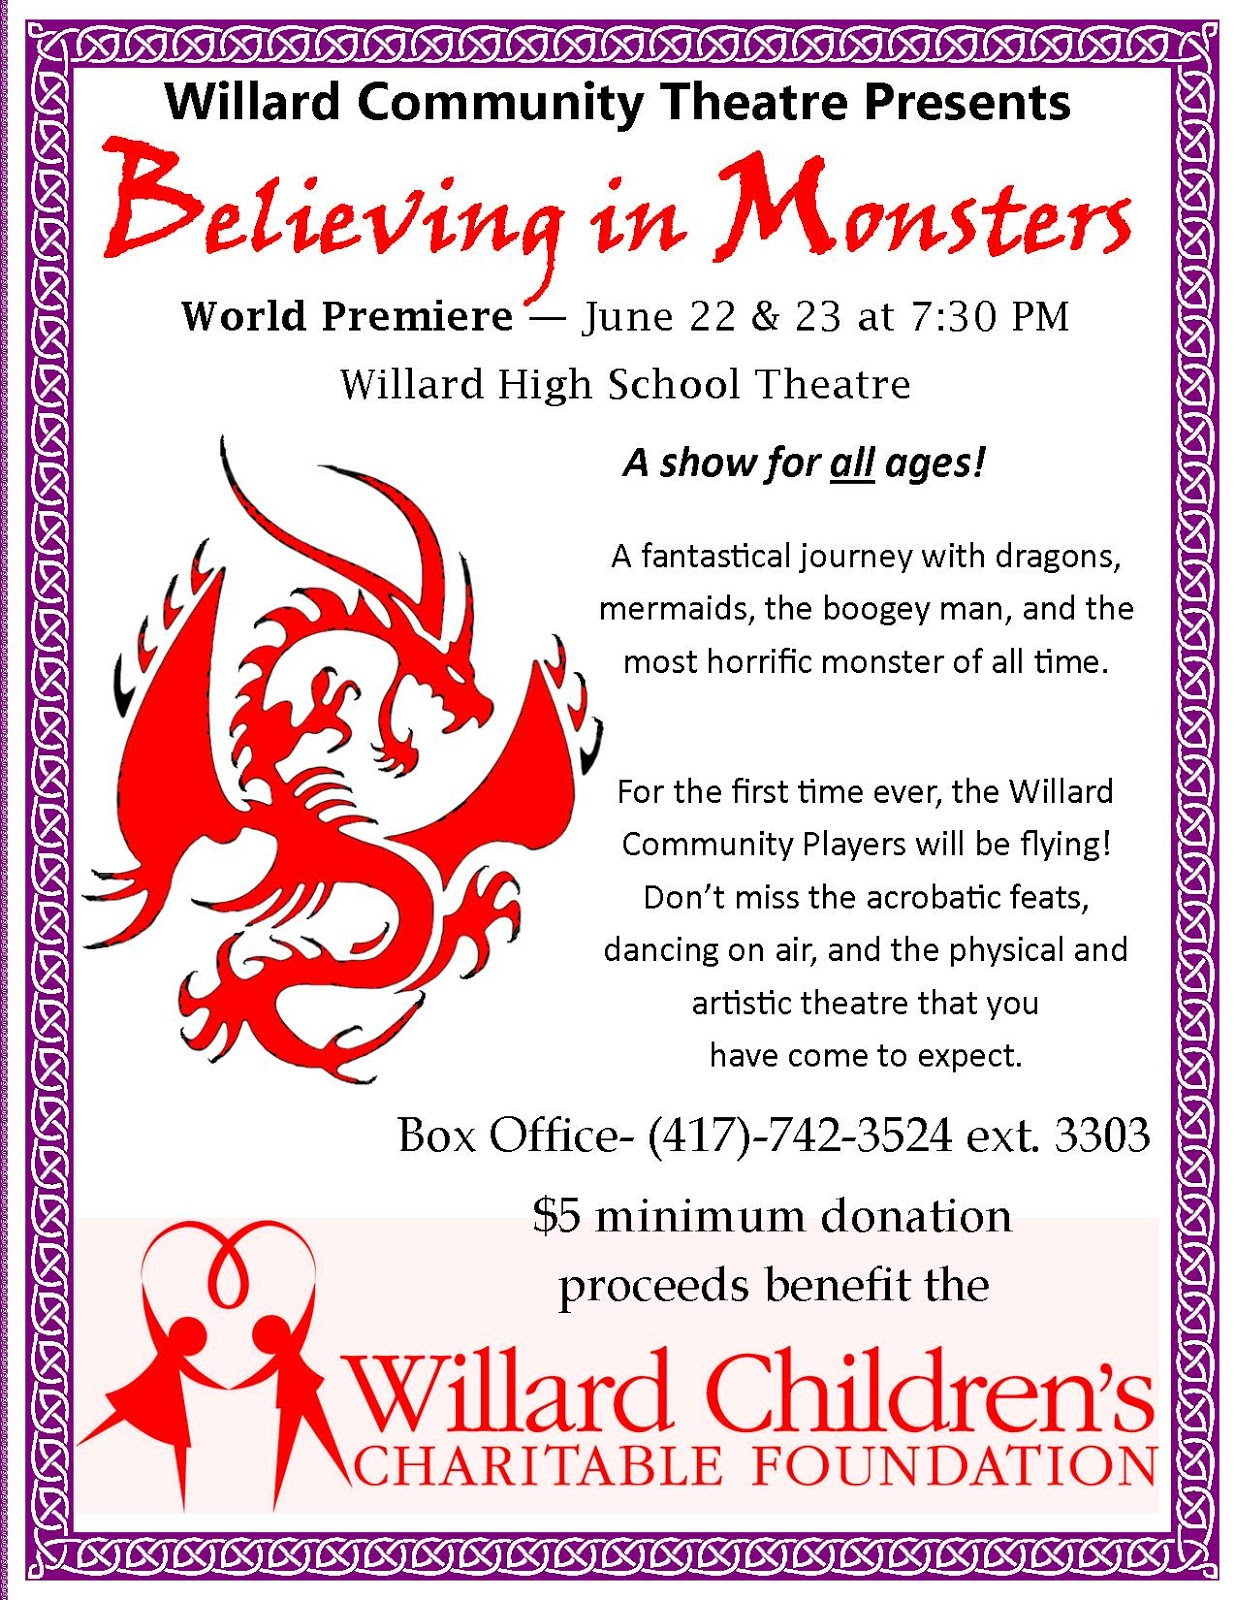 Willard High School and munity Theatre The Healing Theatre